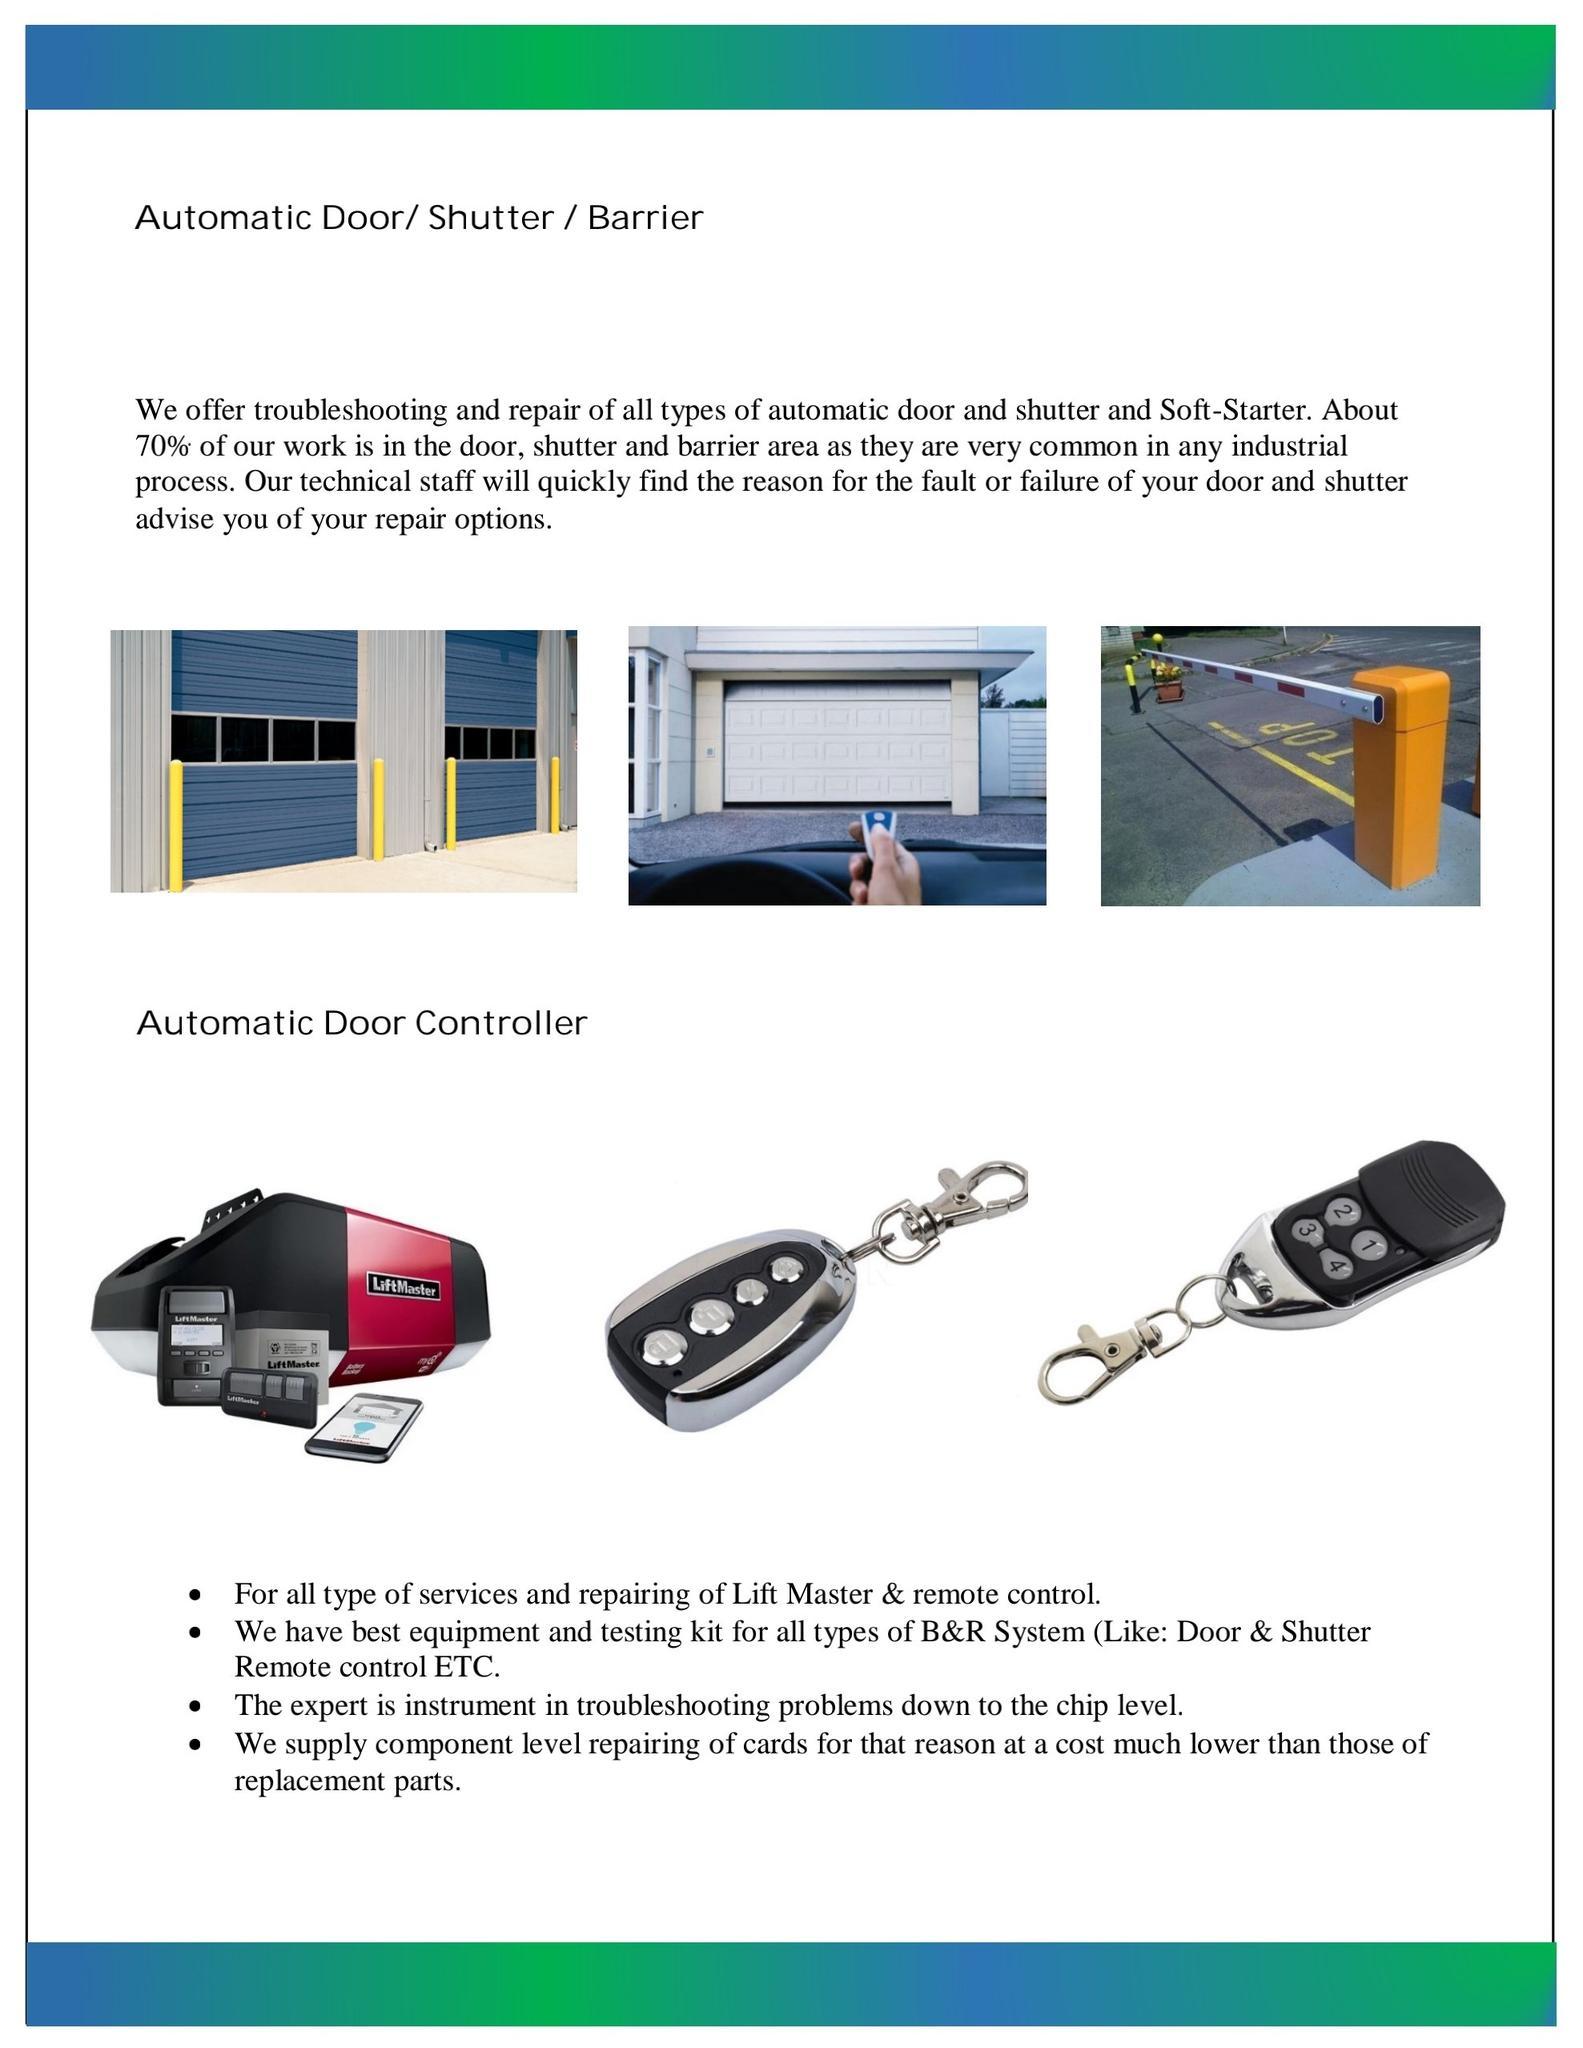 SERVICE- AUTOMATIC DOOR, GENERATOR SERVICE, SUBMER